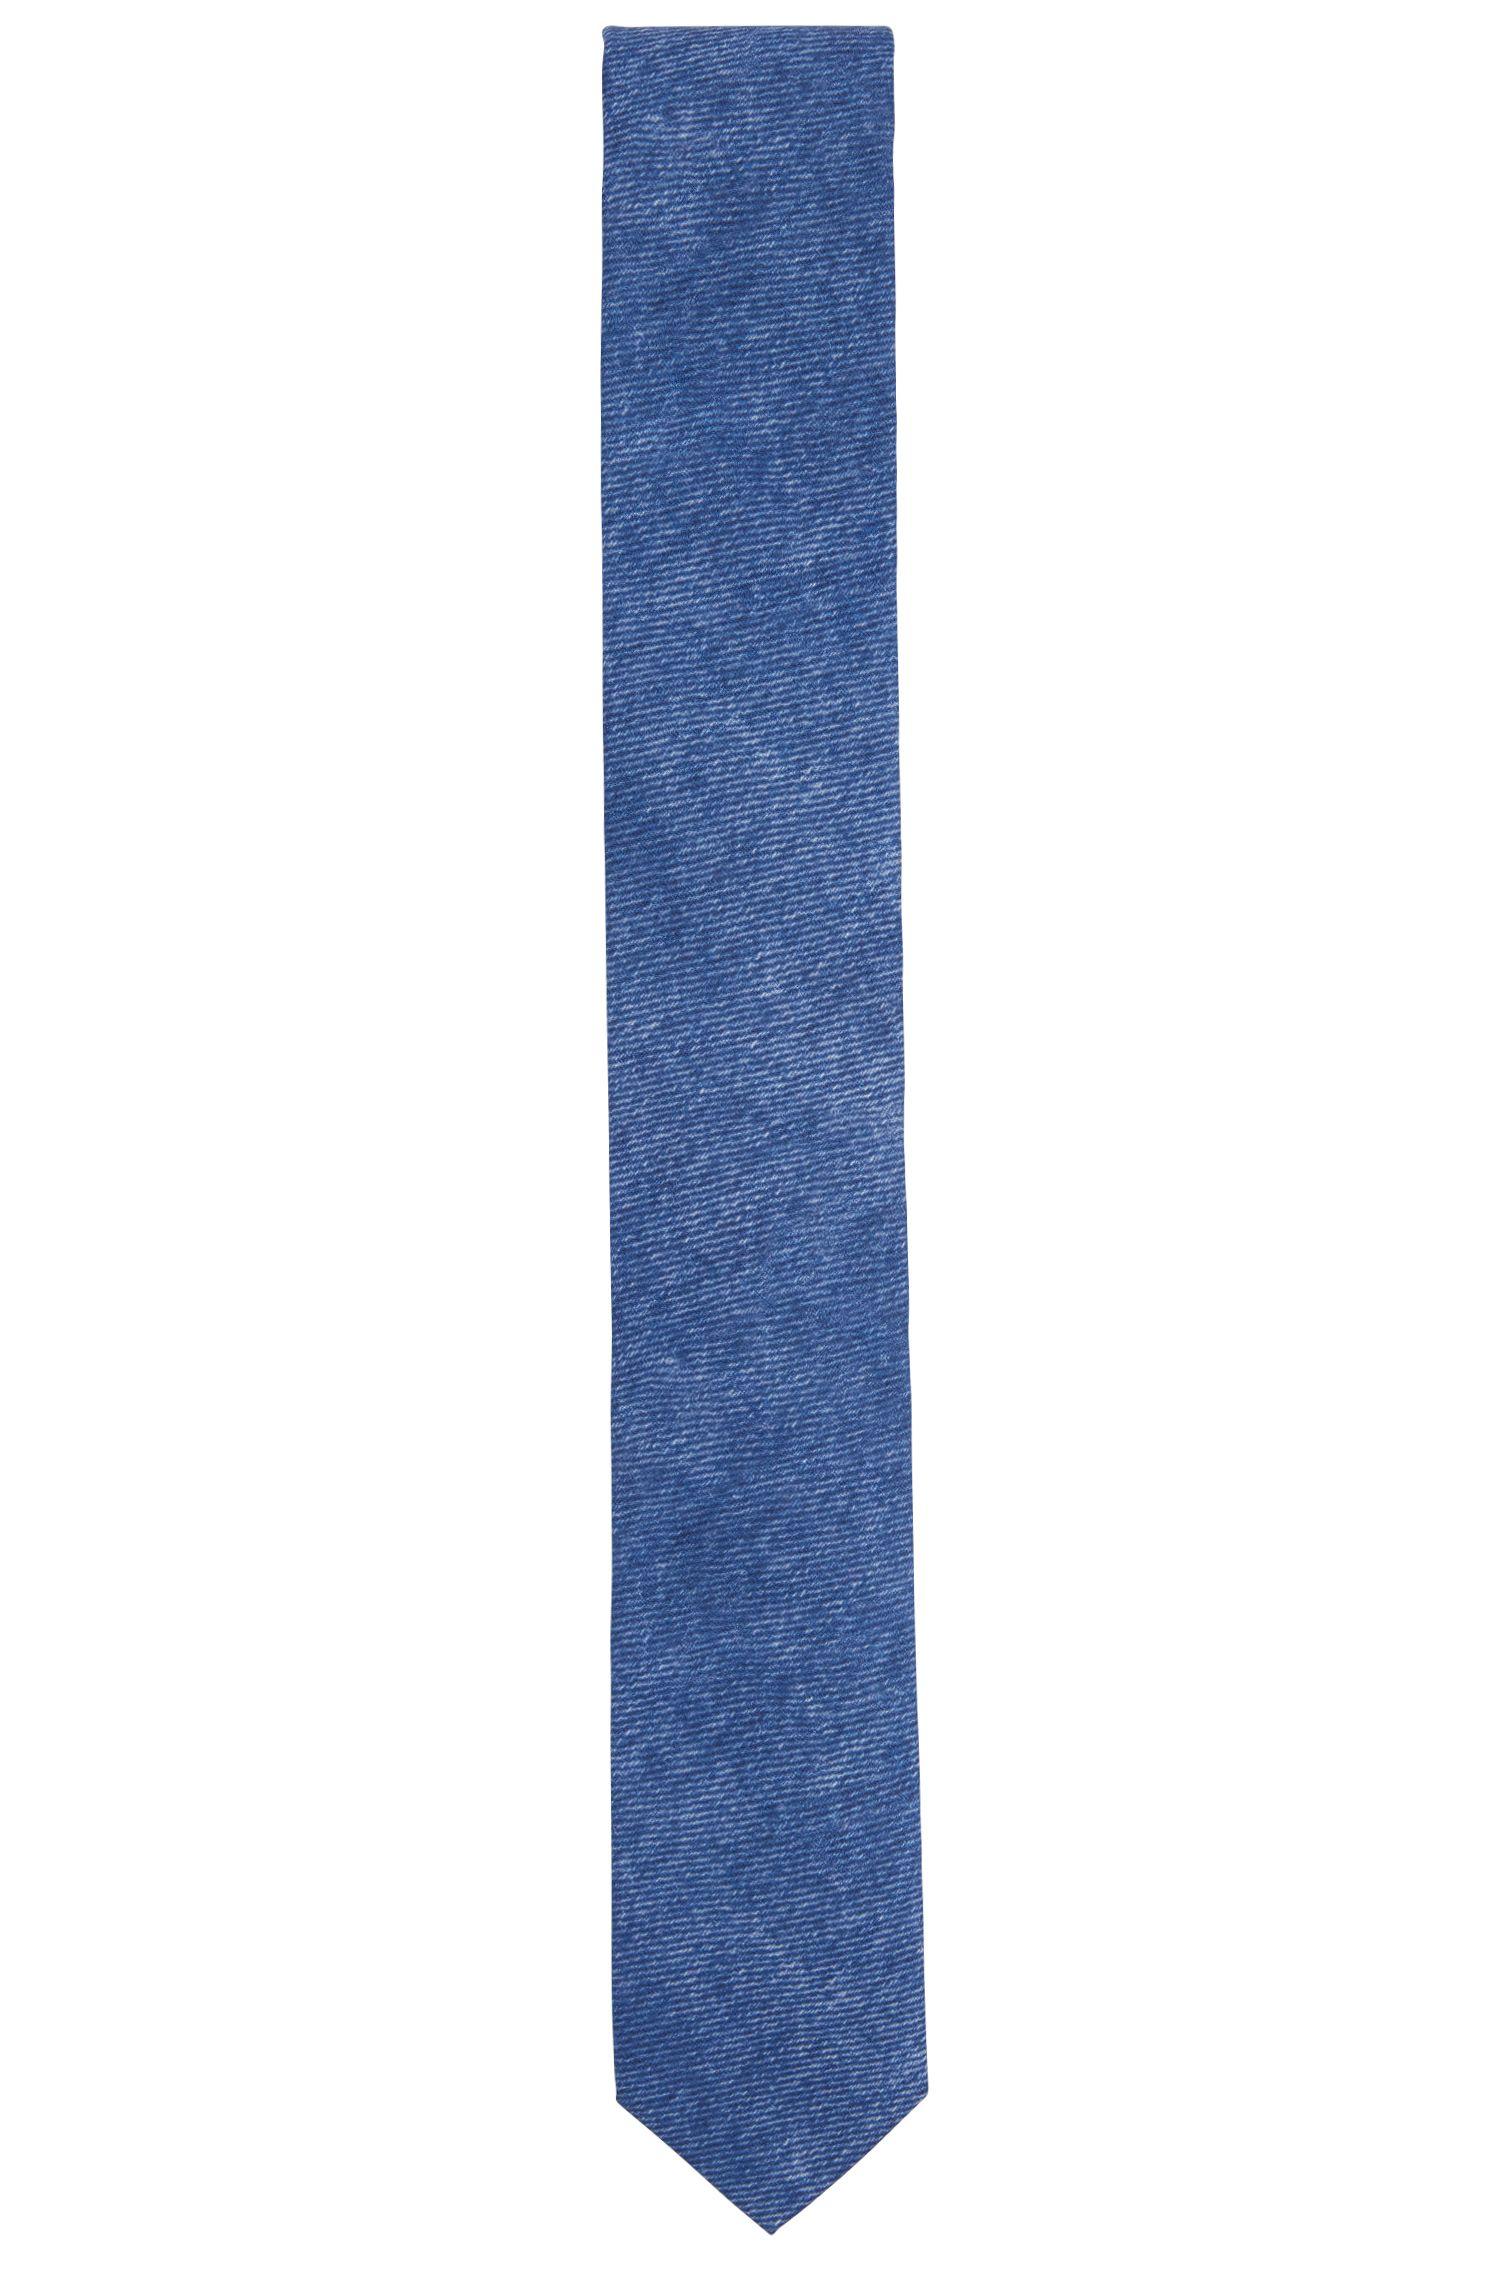 Mottled tie in cotton: 'Tie 6 cm'